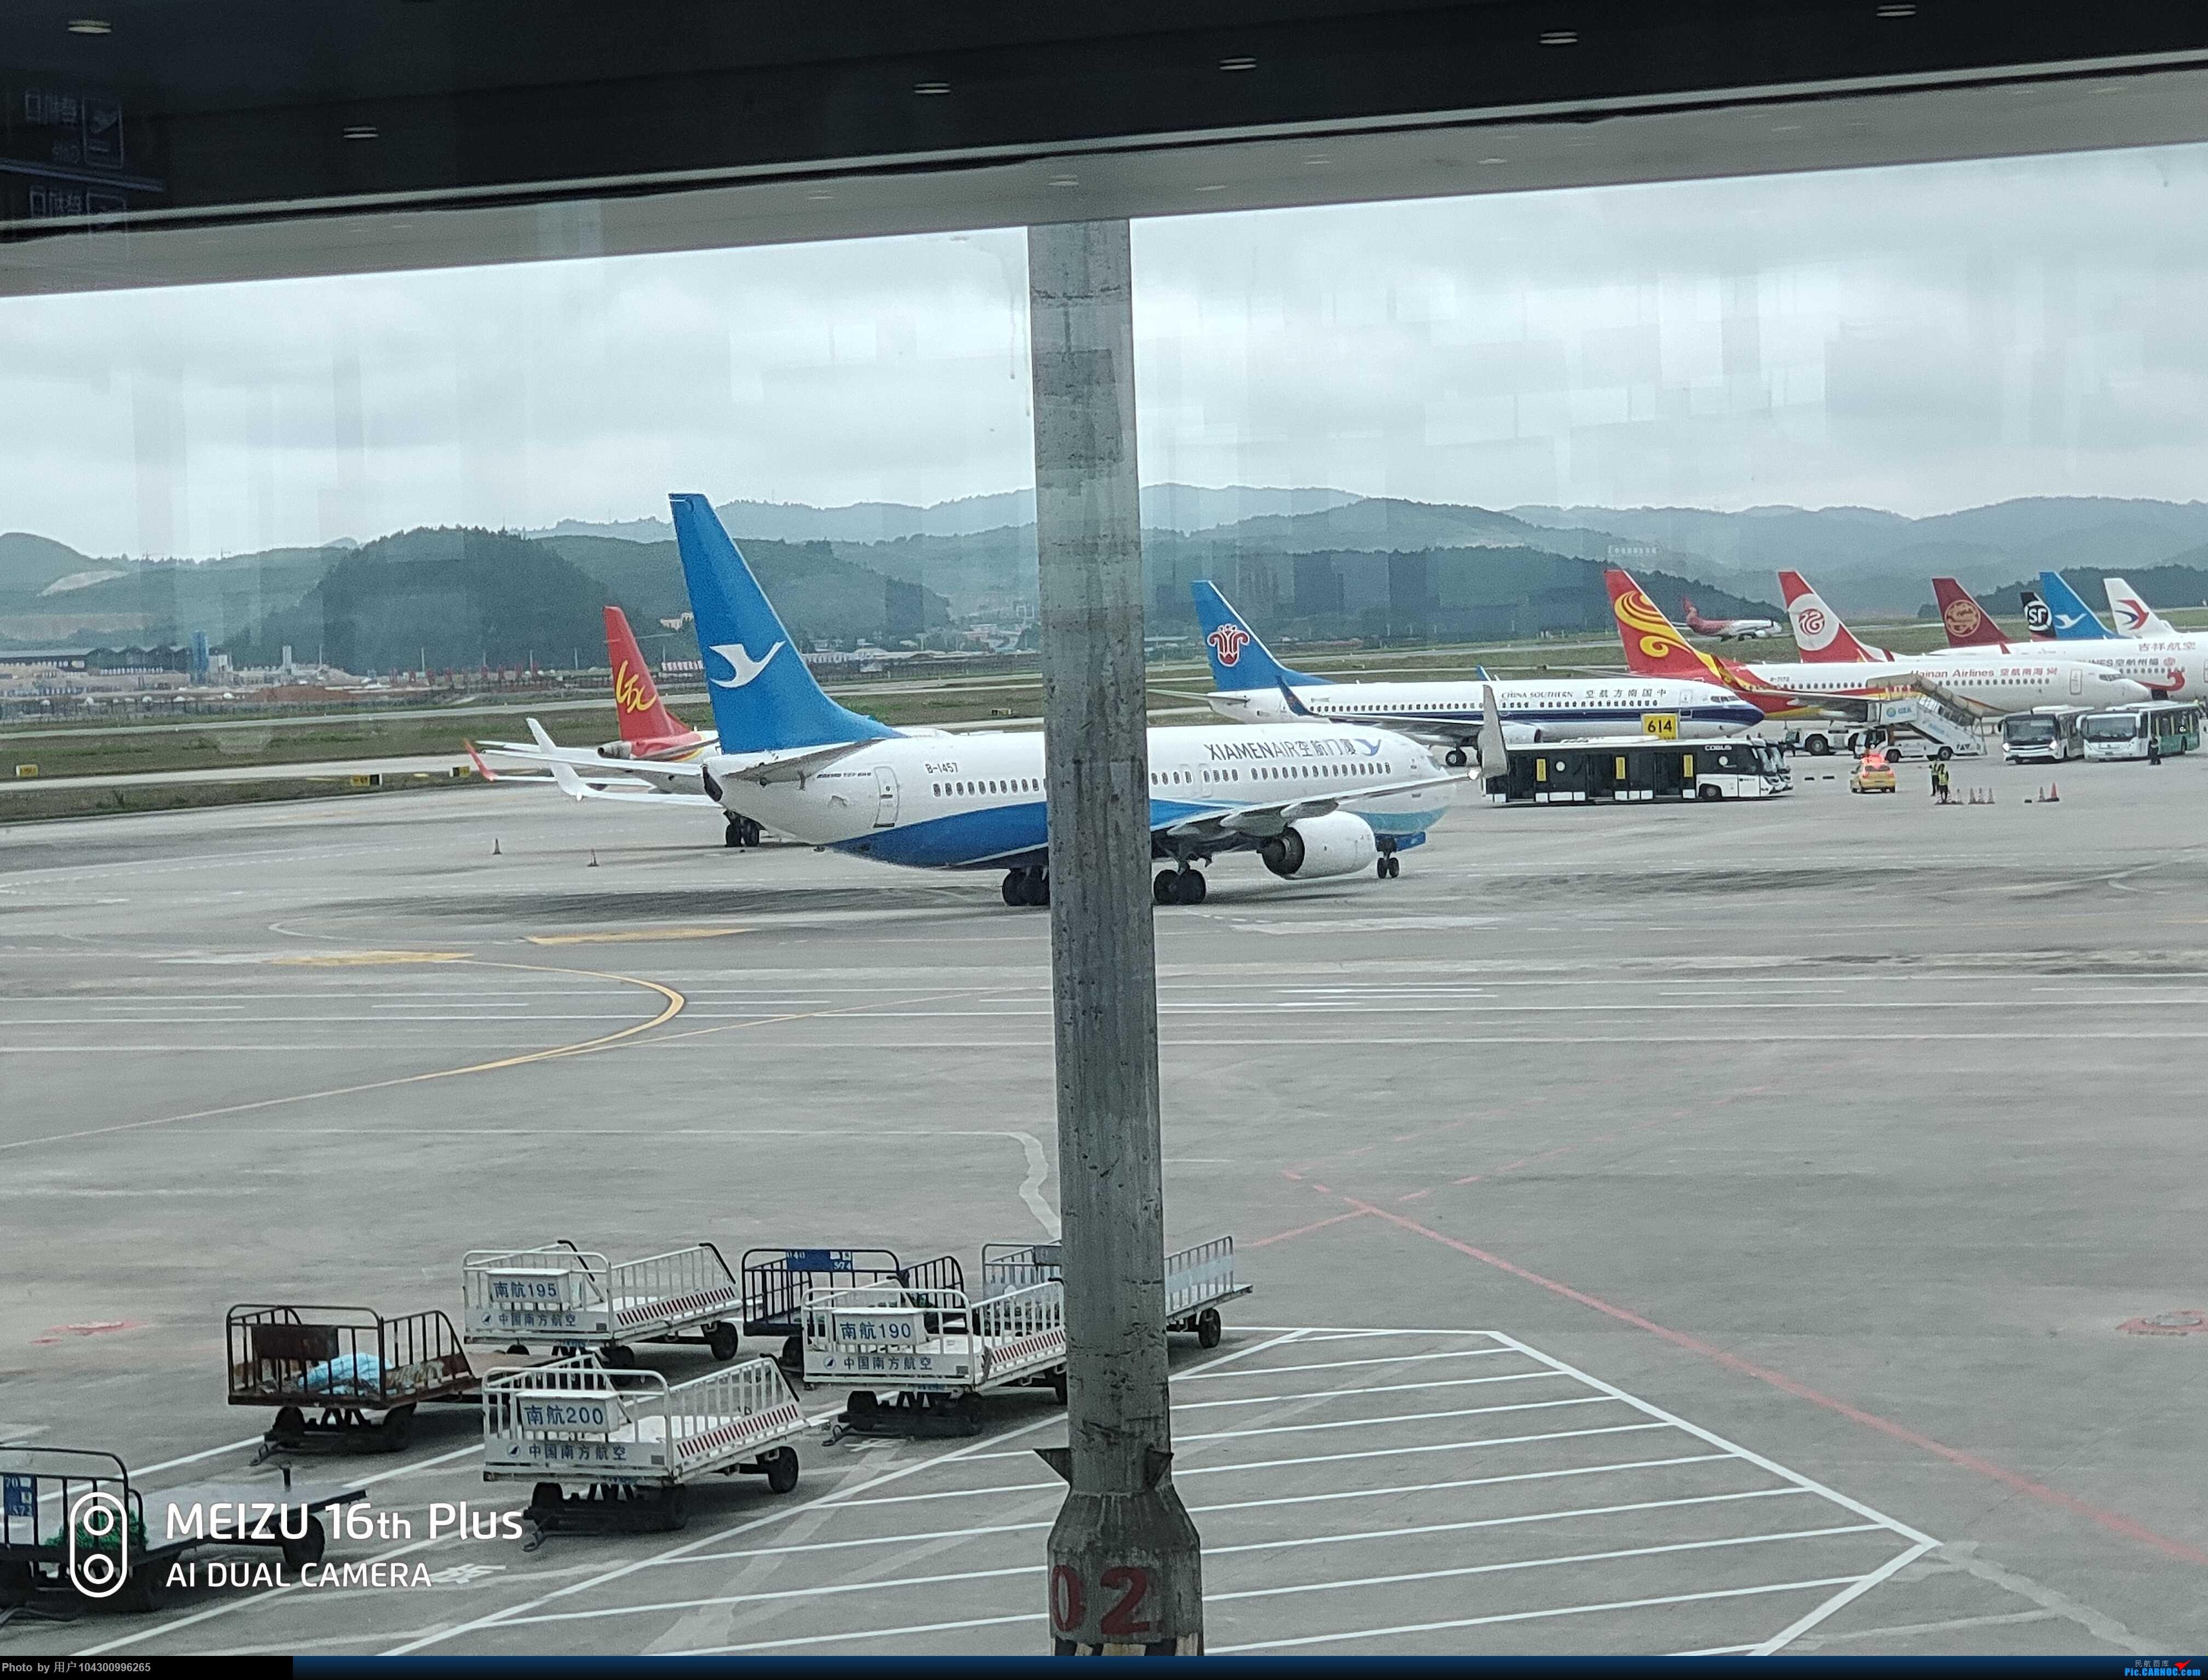 Re:[原创][DM哥飞行游记]-多彩贵州航空贵阳-茅台当日往返 BOEING 737-800 B-1457 中国贵阳龙洞堡国际机场